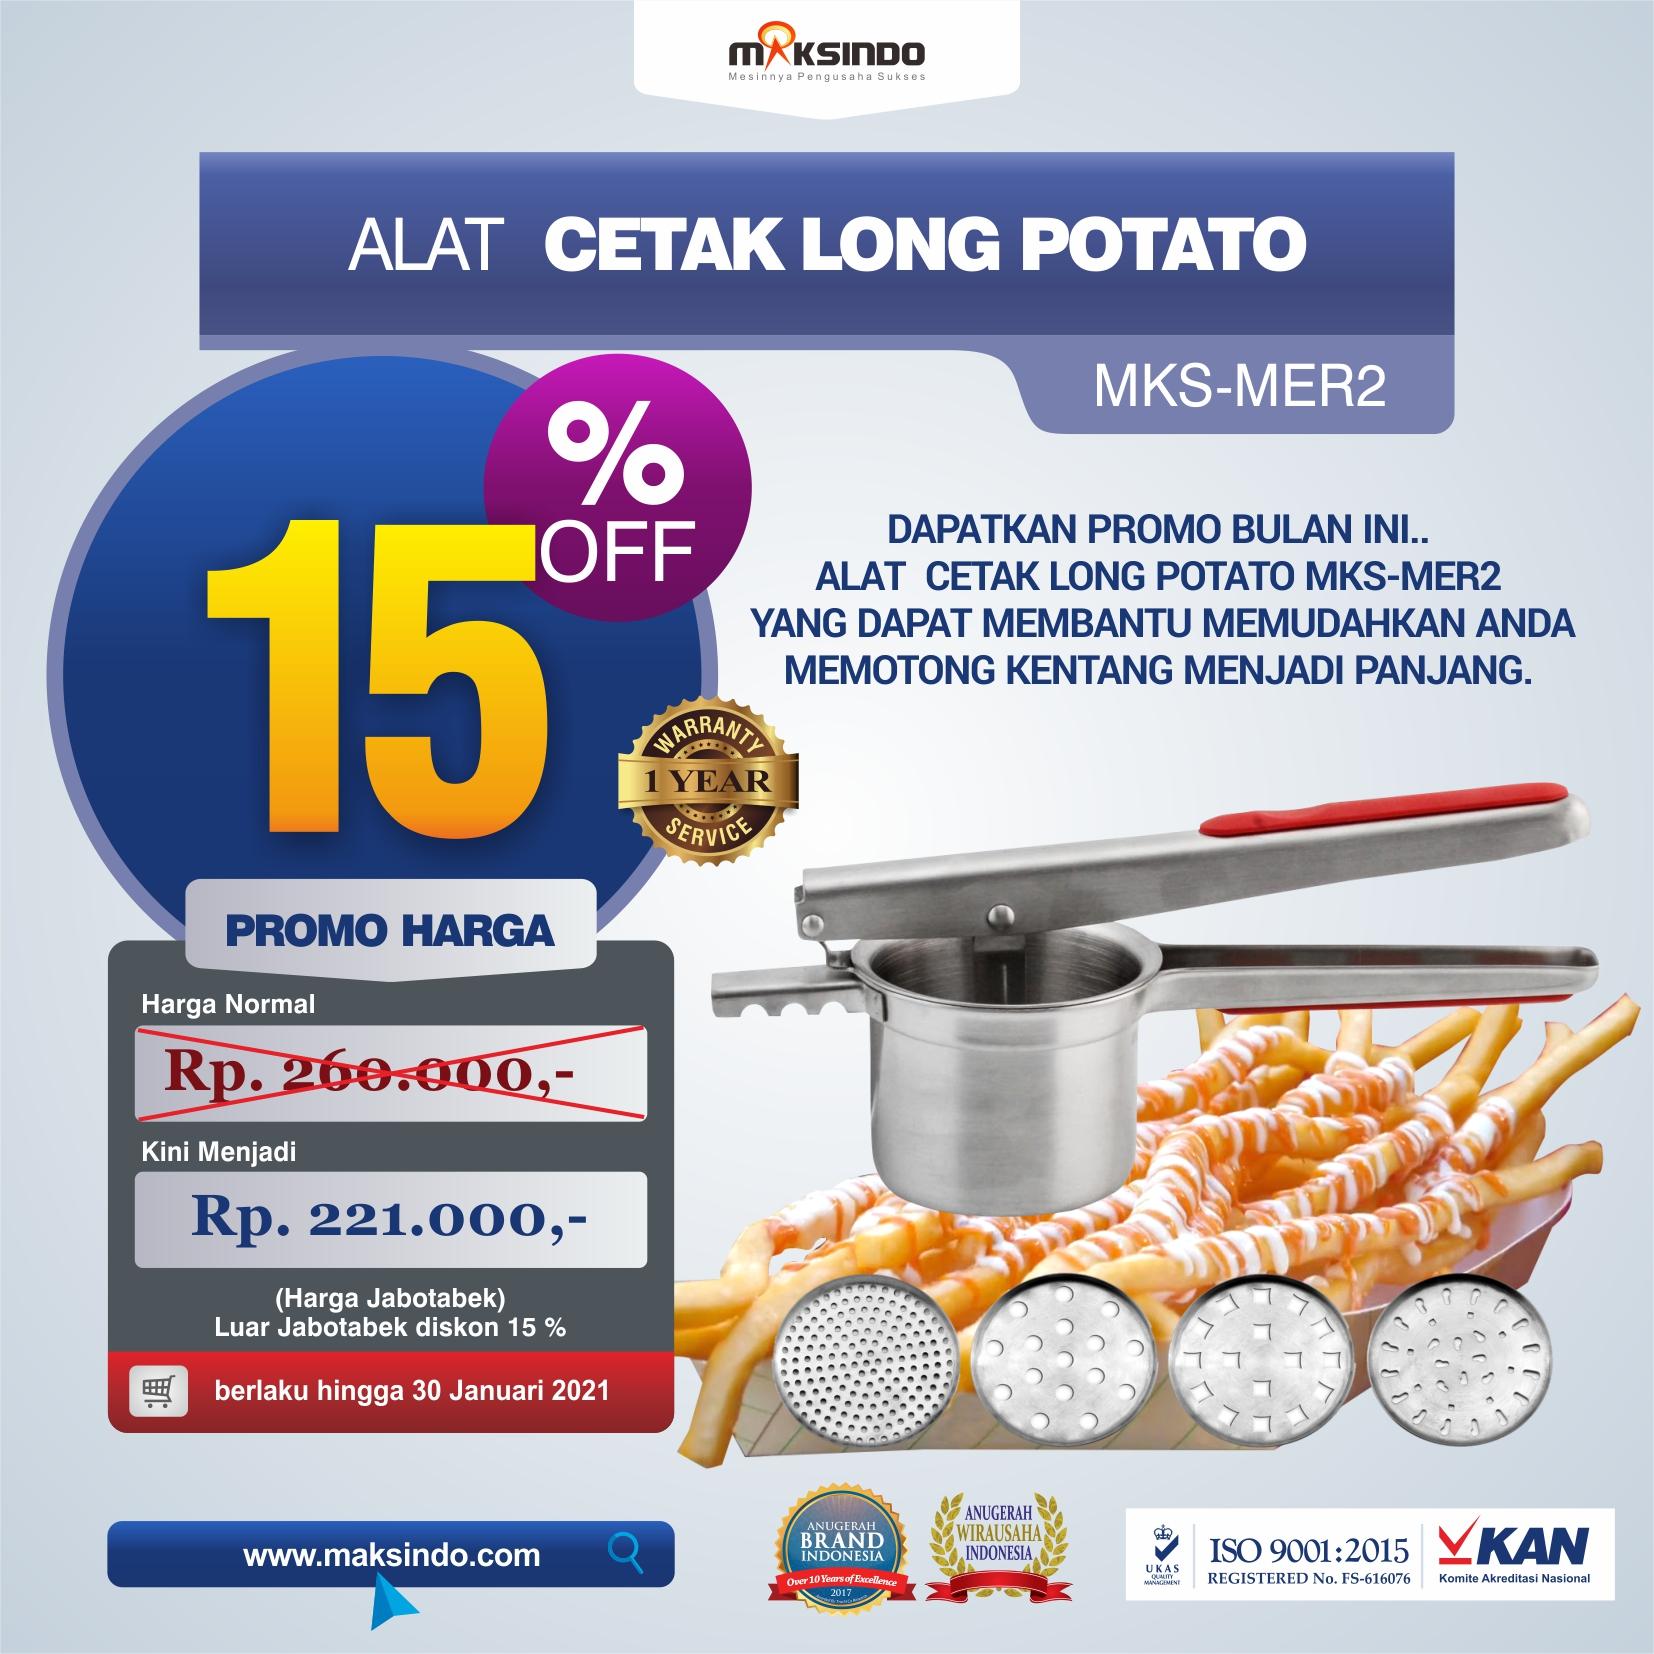 Jual Alat Cetak Long Potato MKS-MER2 di Tangerang